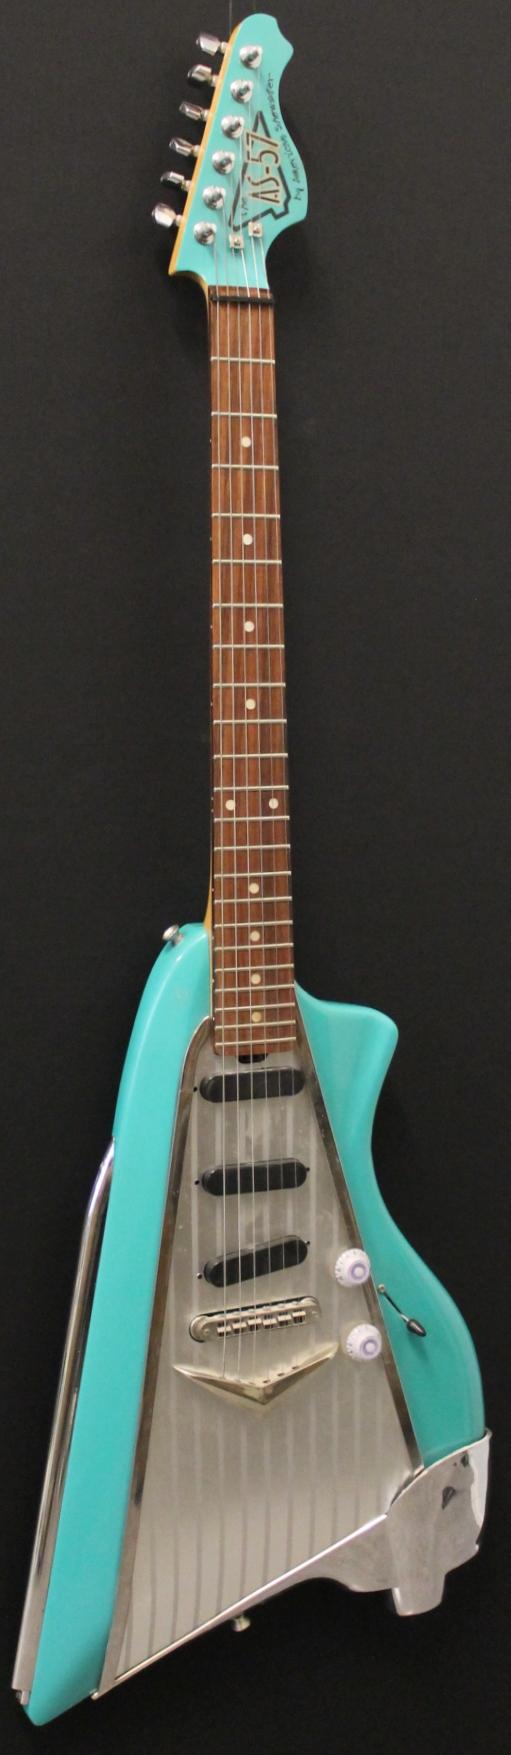 Kitarakuu - American Showster AS-57 Blue